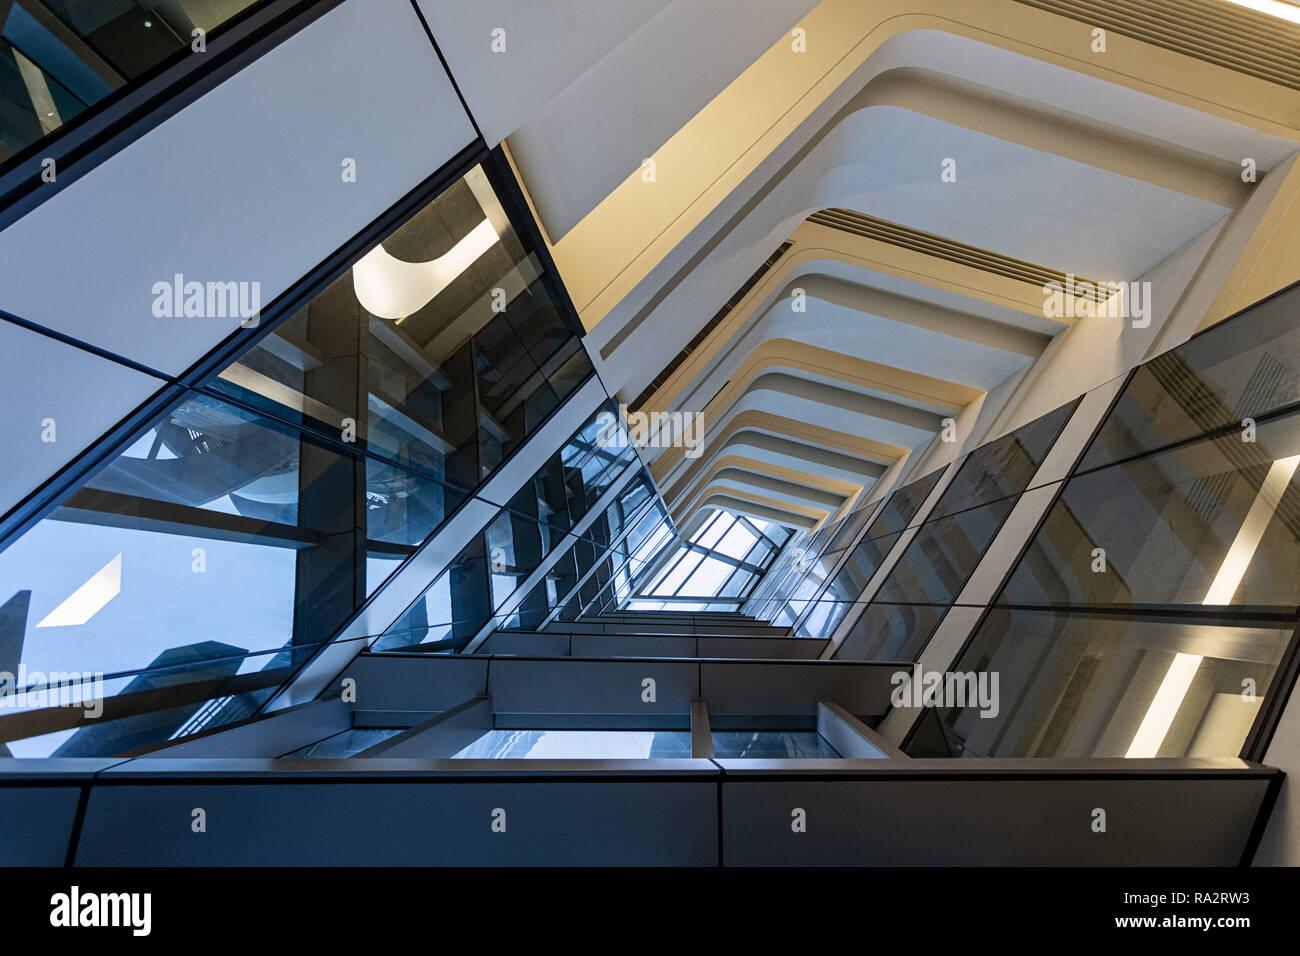 Interior of the Jockey Club Innovation Tower at Hong Kong Polytechnic University Stock Photo